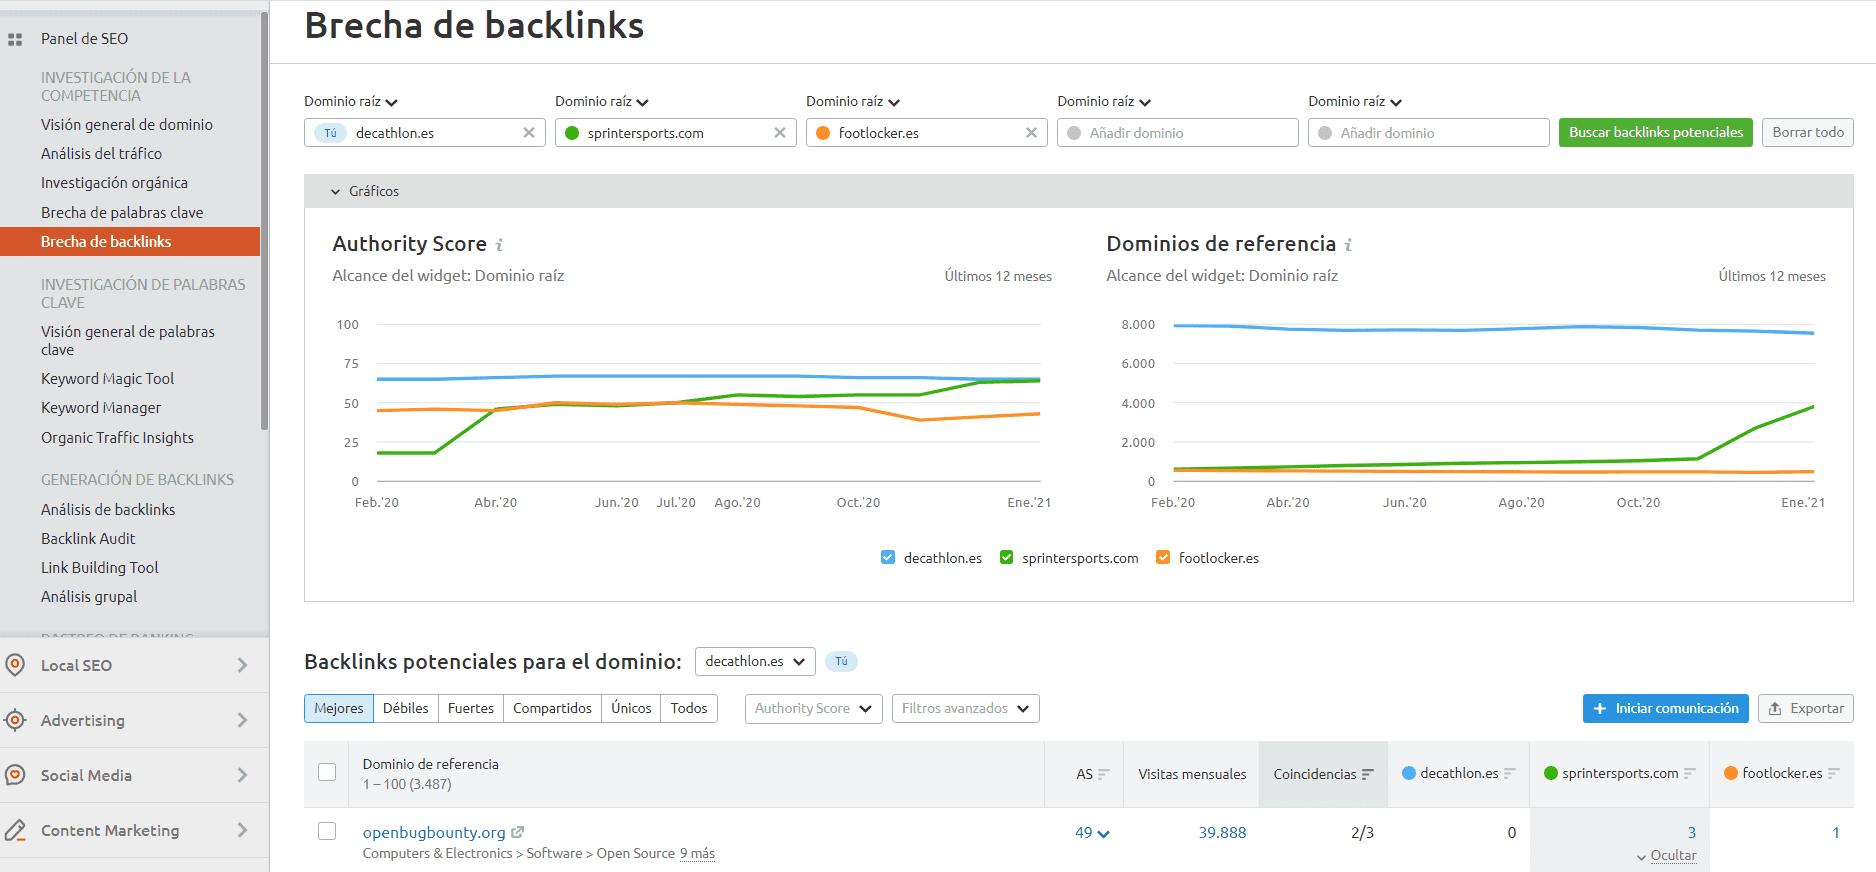 brecha de backlinks